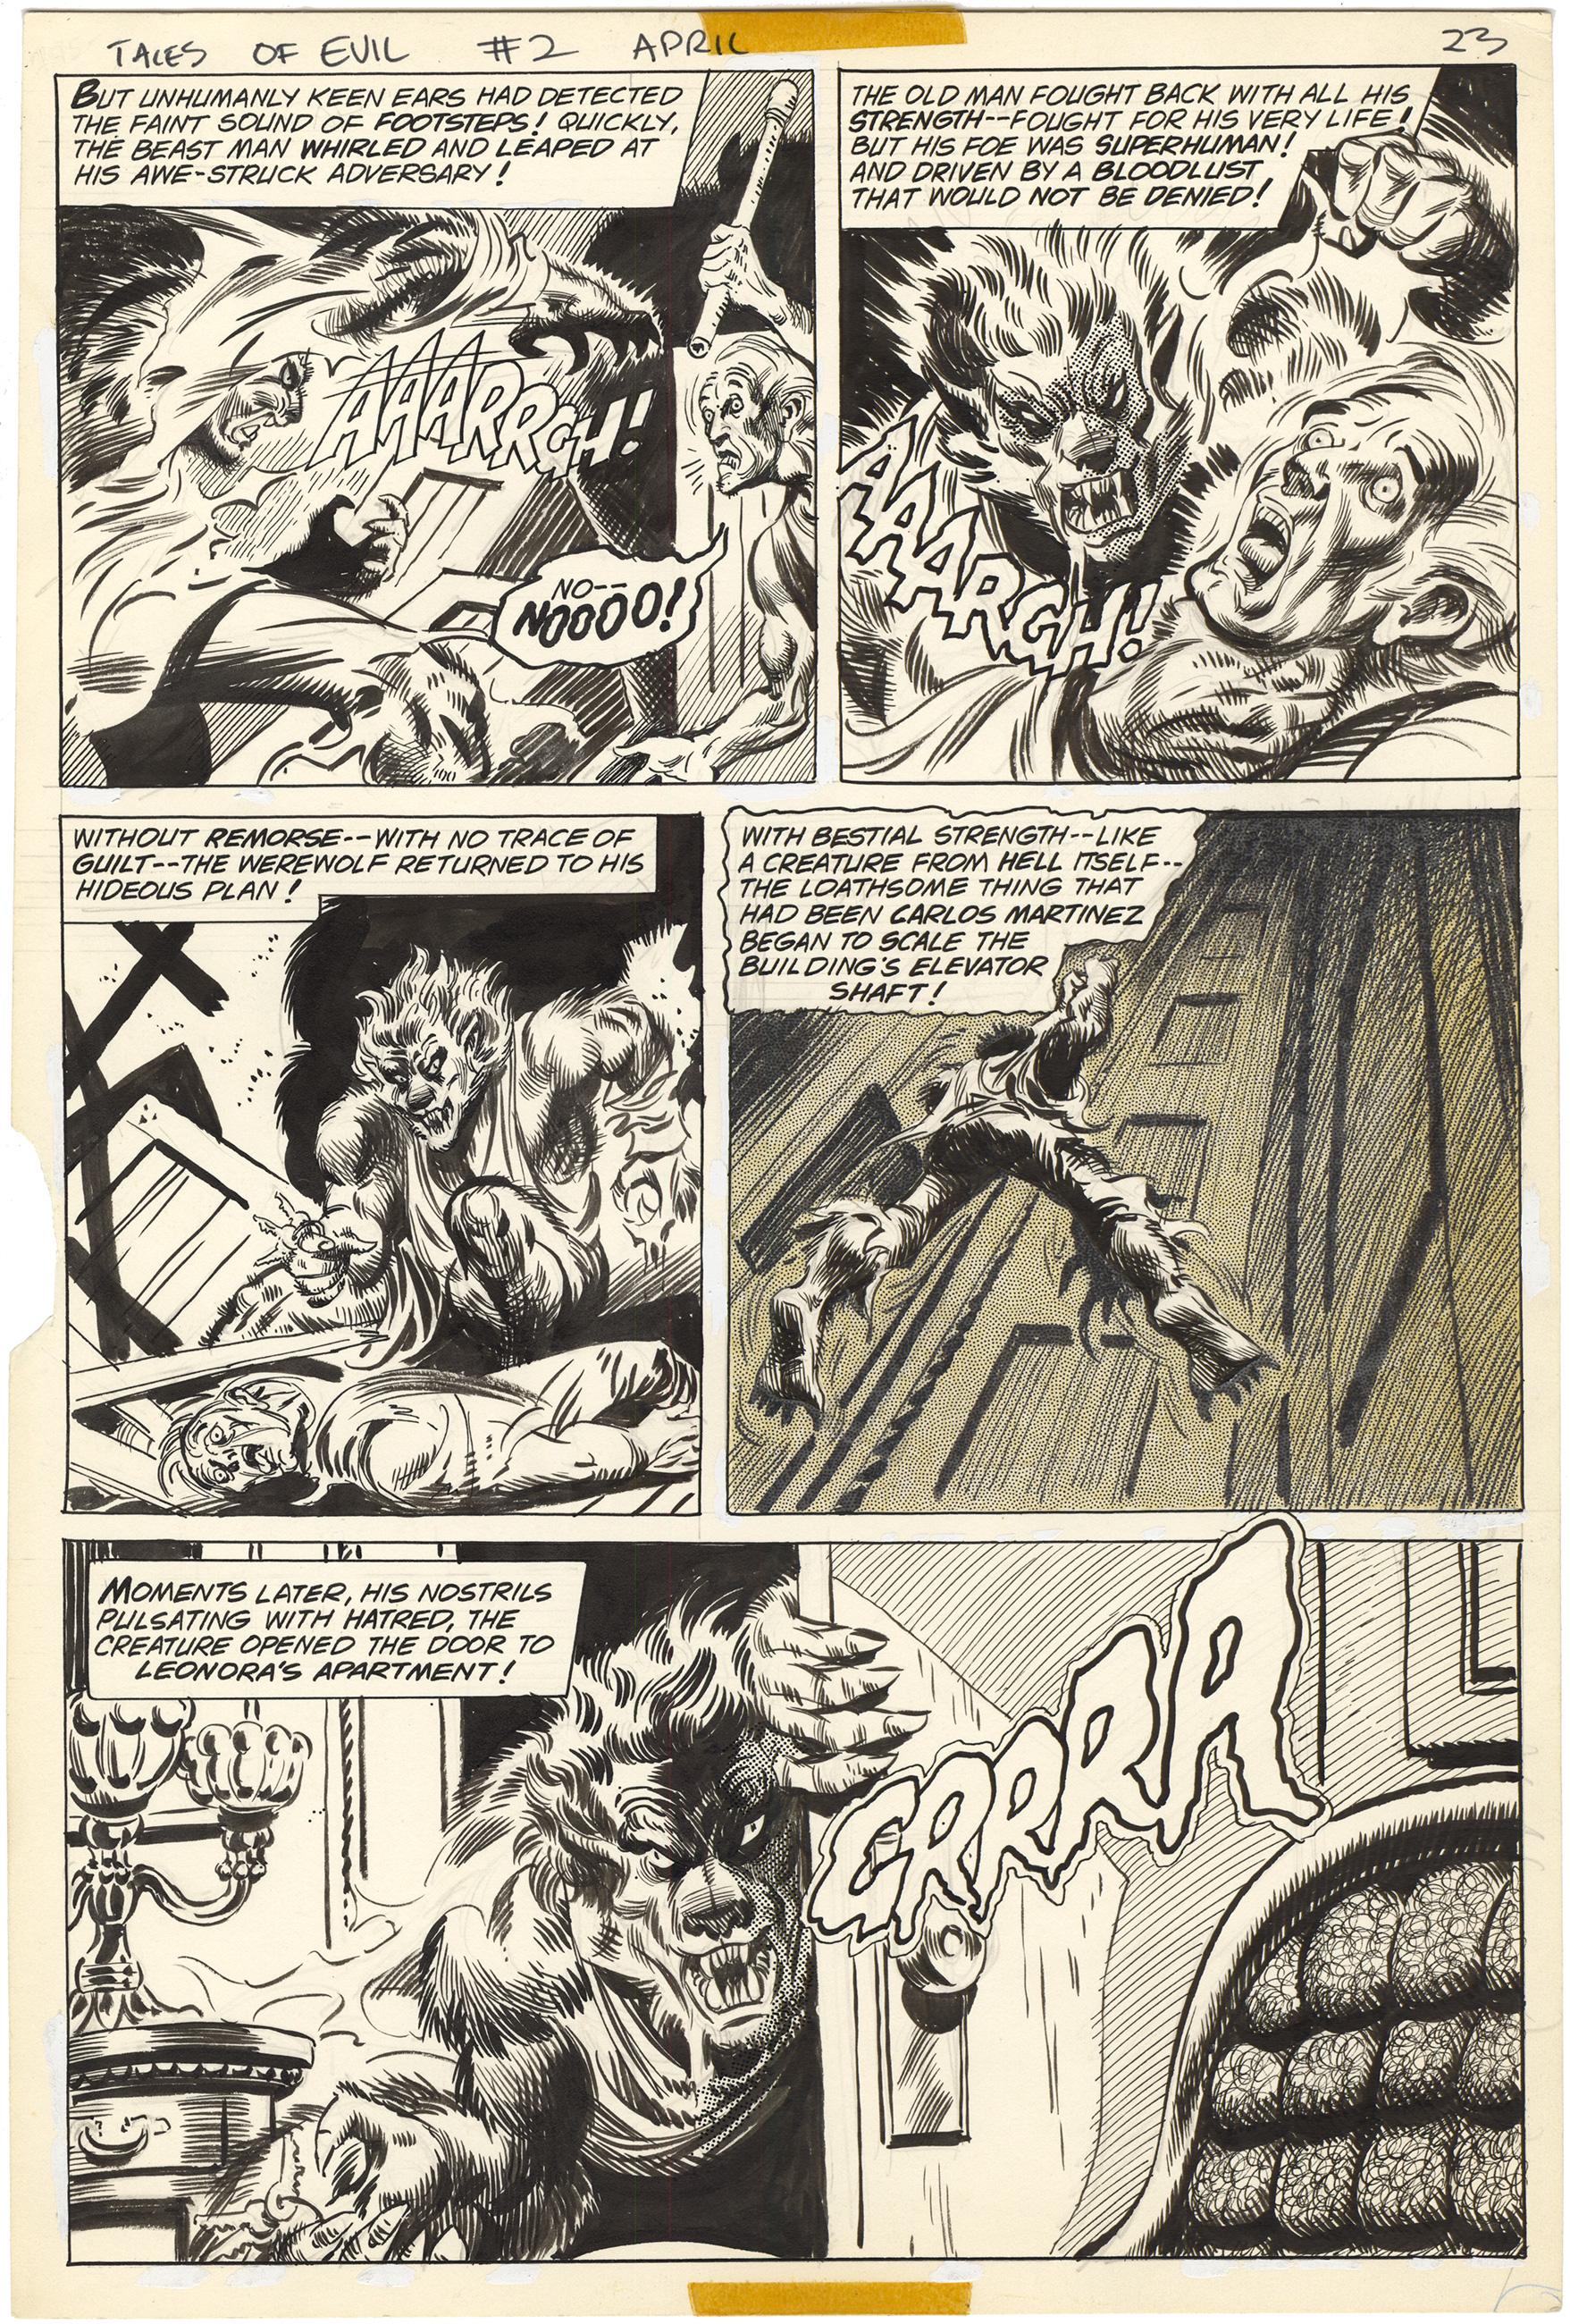 Tales of Evil #2 p23